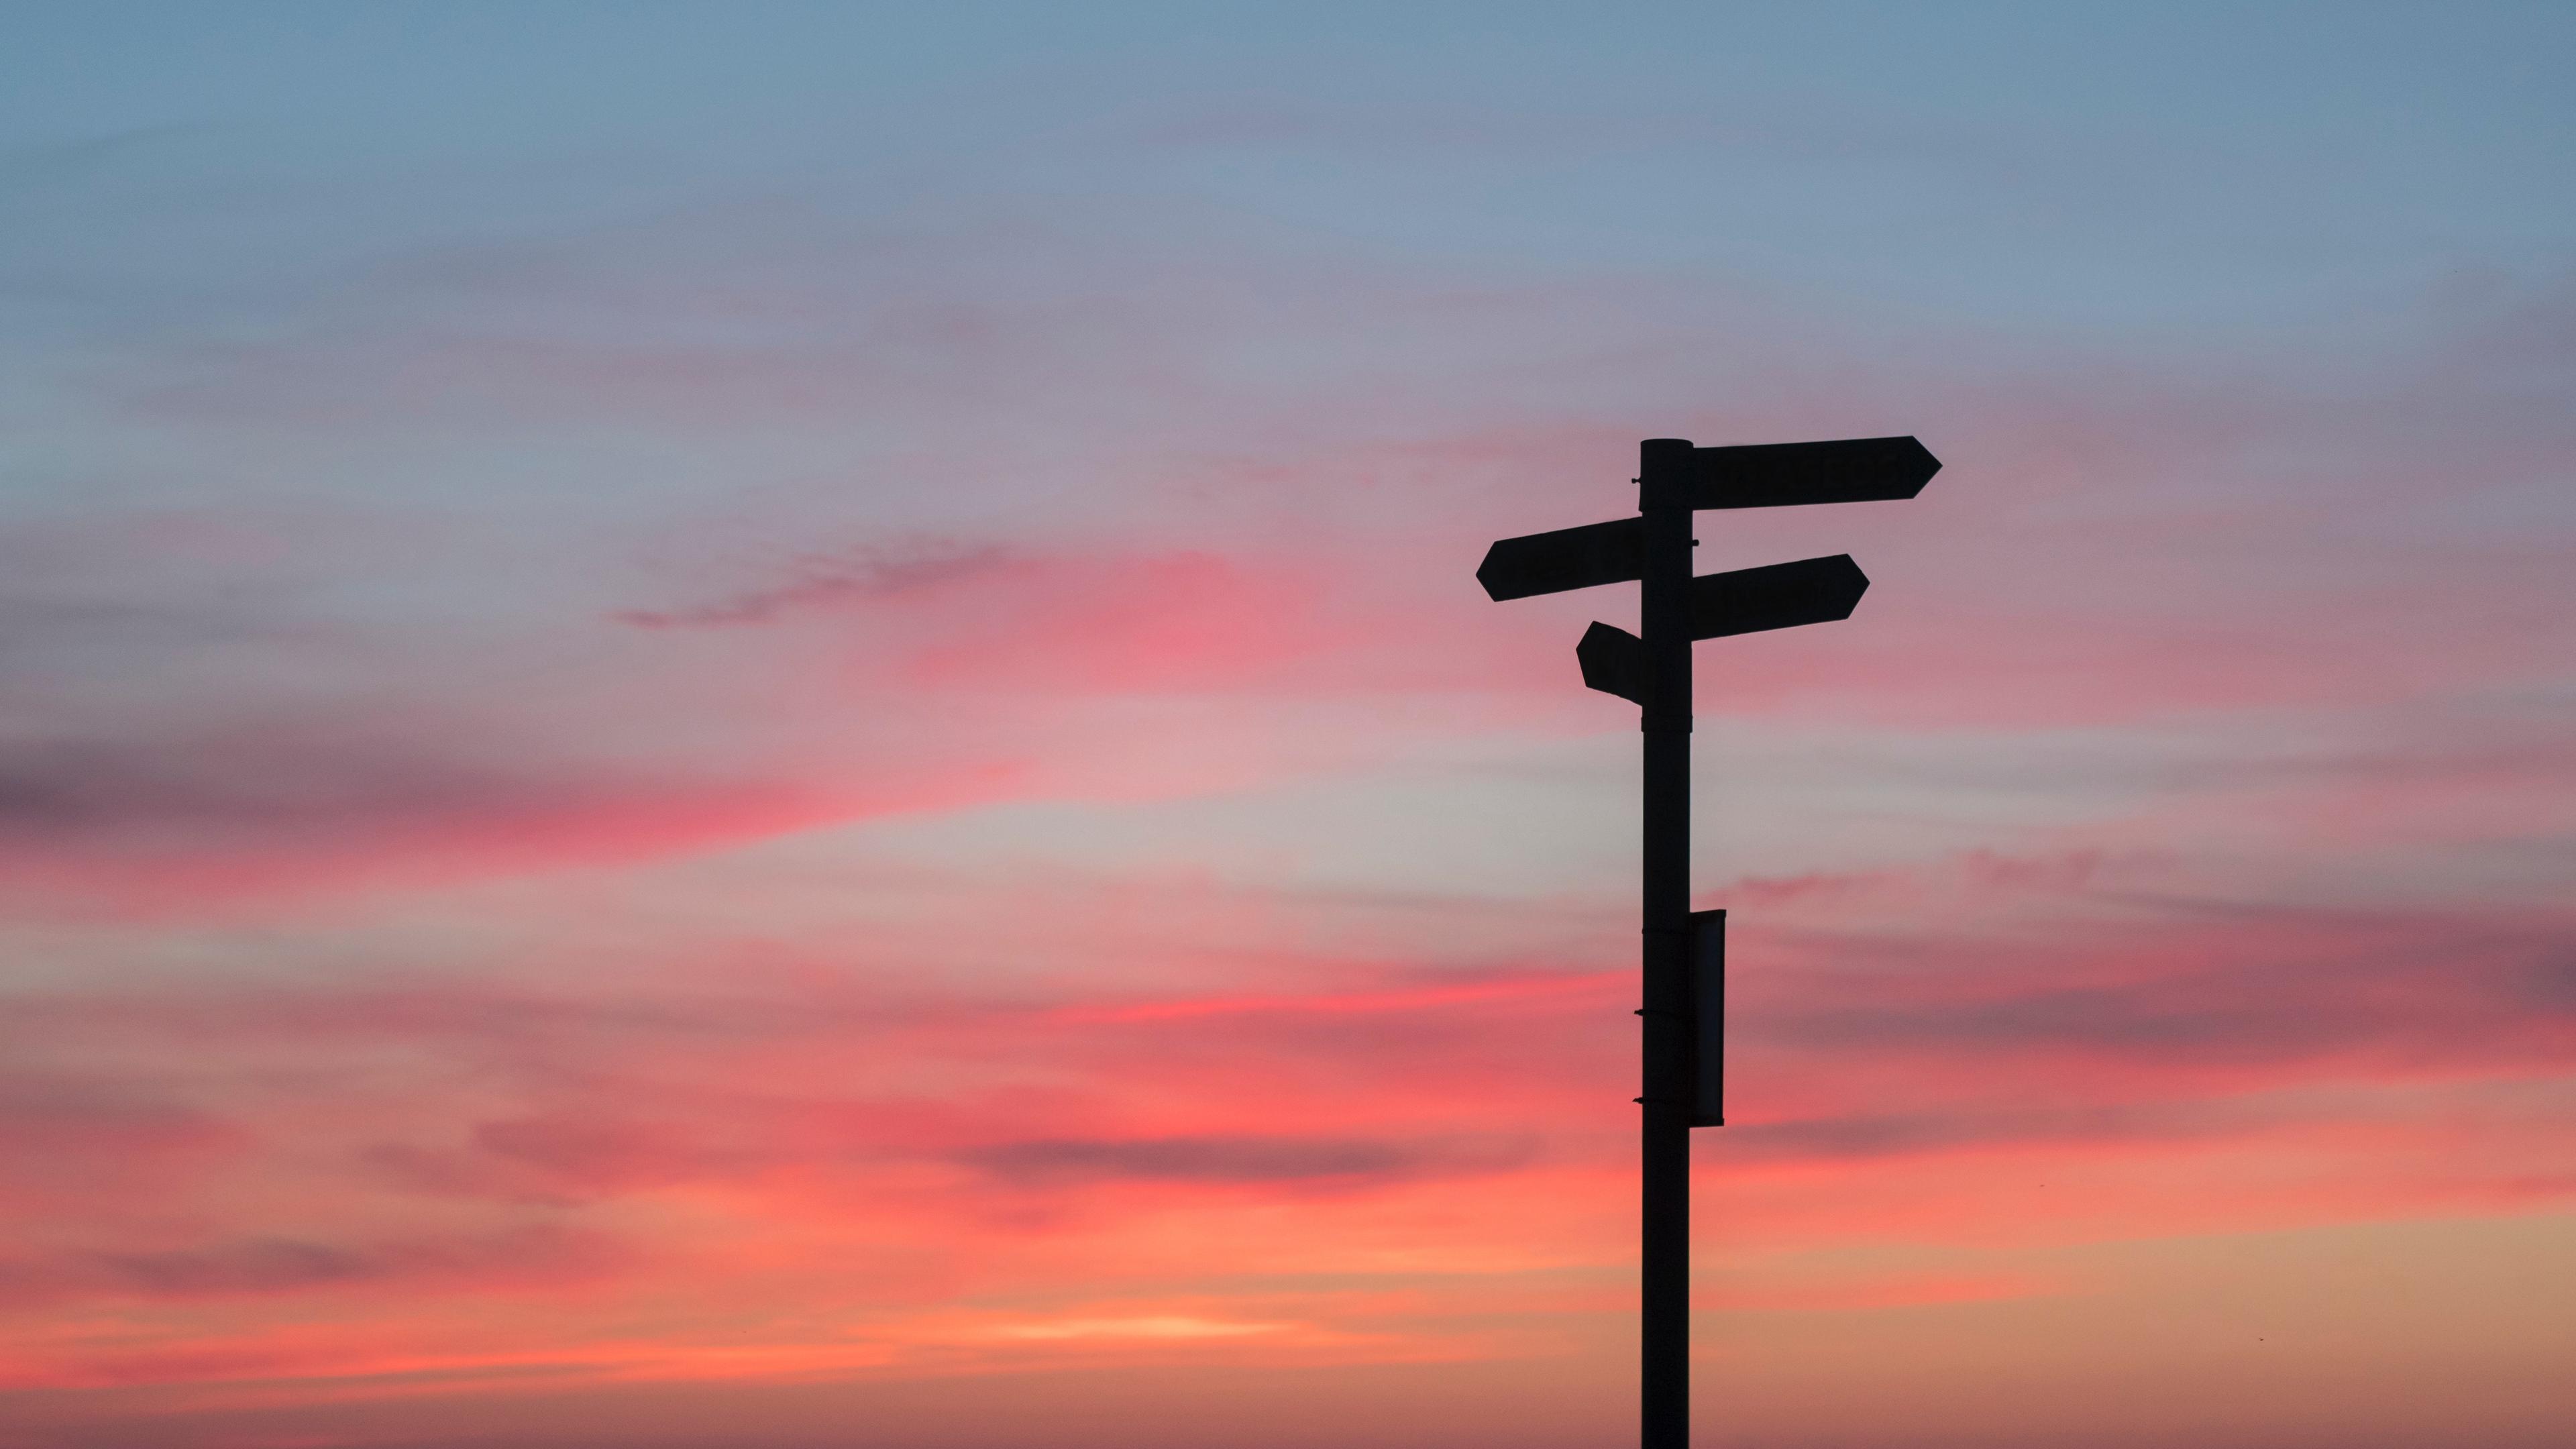 pointer arrow choice direction sunset 4k 1541113483 - pointer, arrow, choice, direction, sunset 4k - pointer, Choice, Arrow